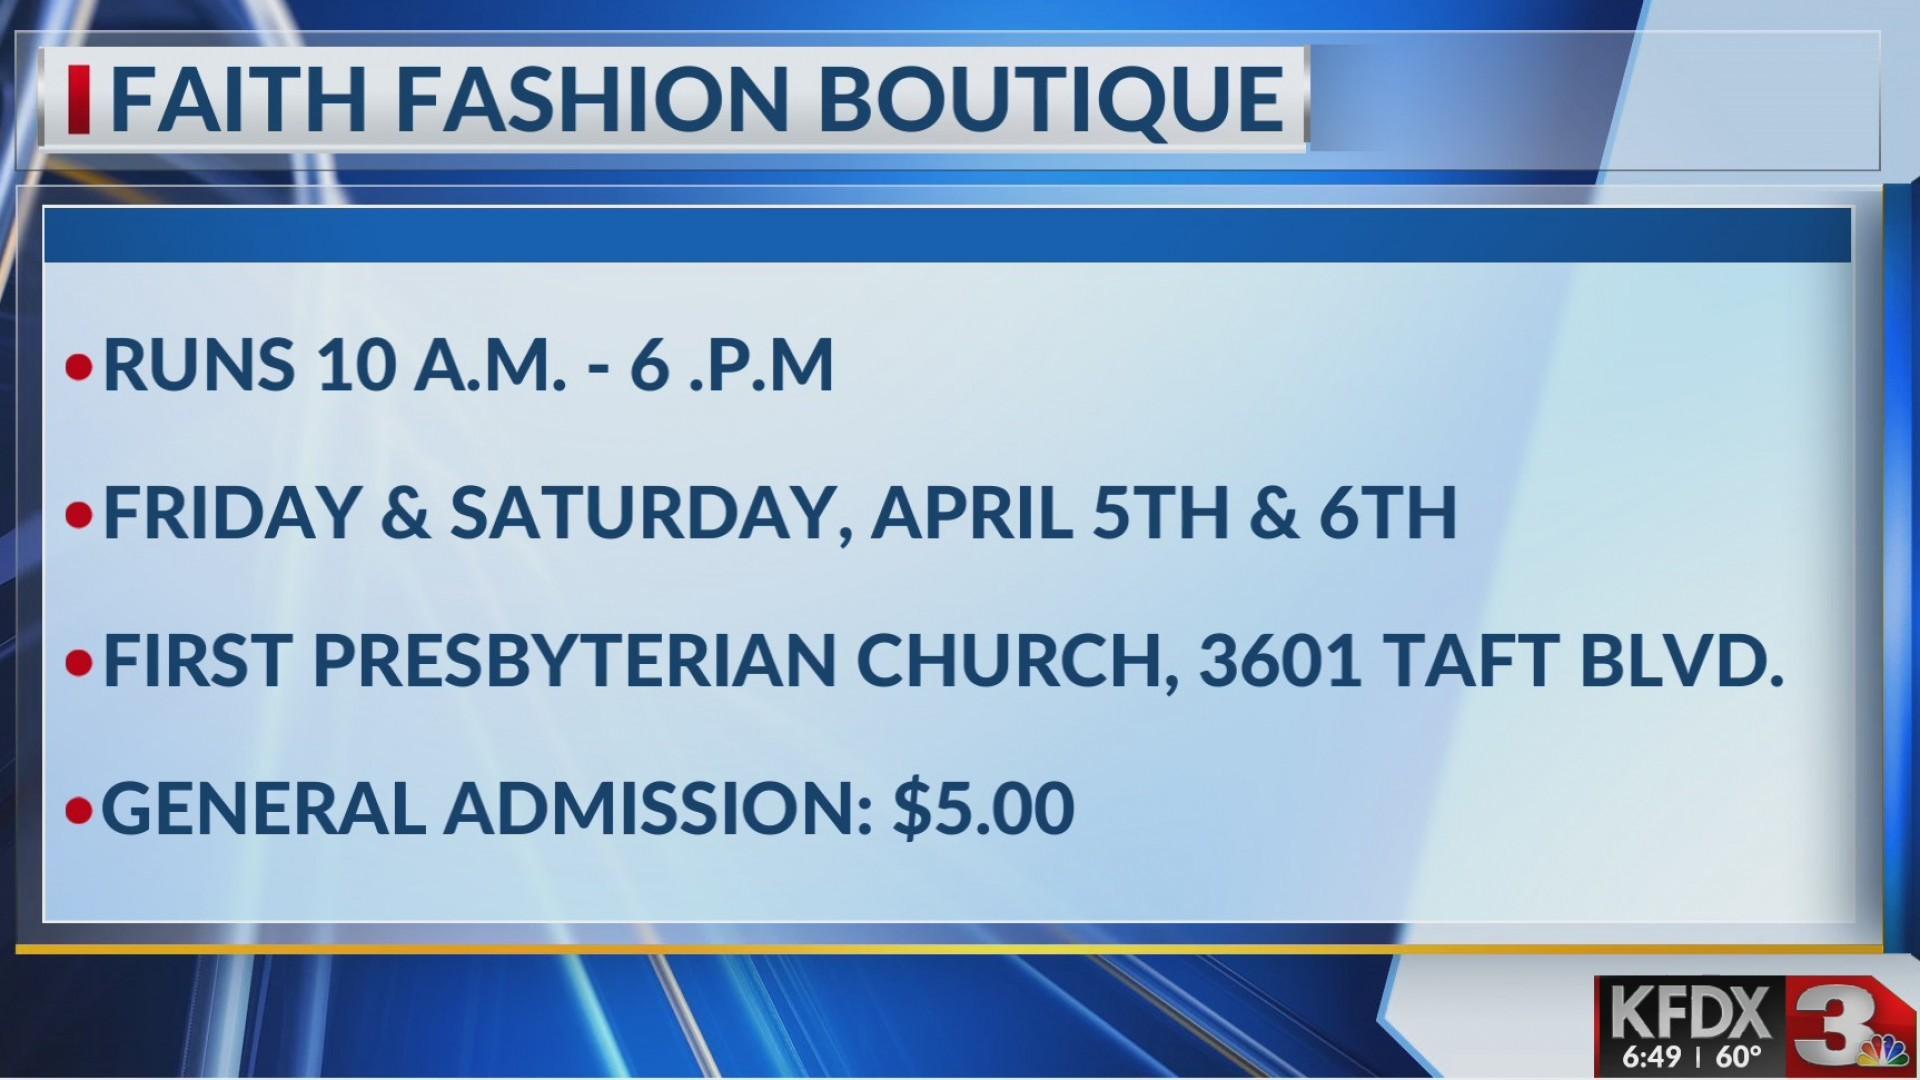 Faith_Fashion_Boutique_0_20190329115832